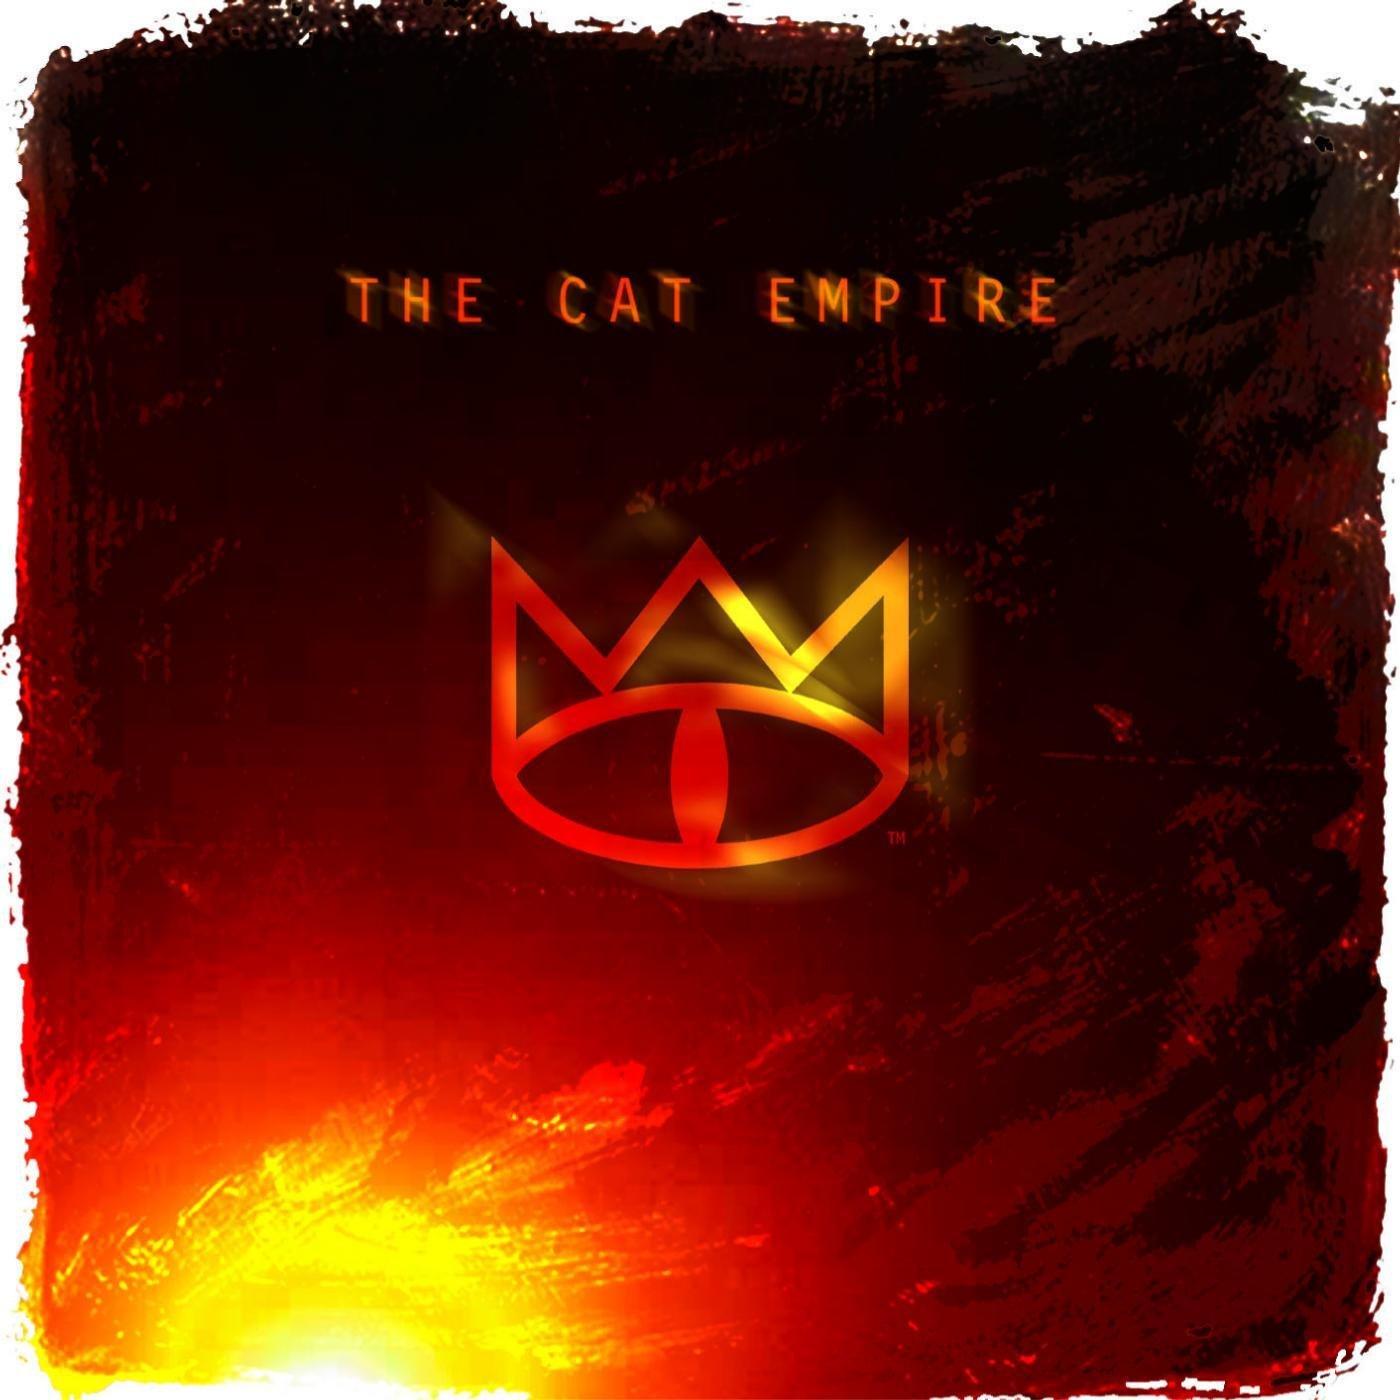 The Cat Empire – The Cat Empire (2003) [FLAC]